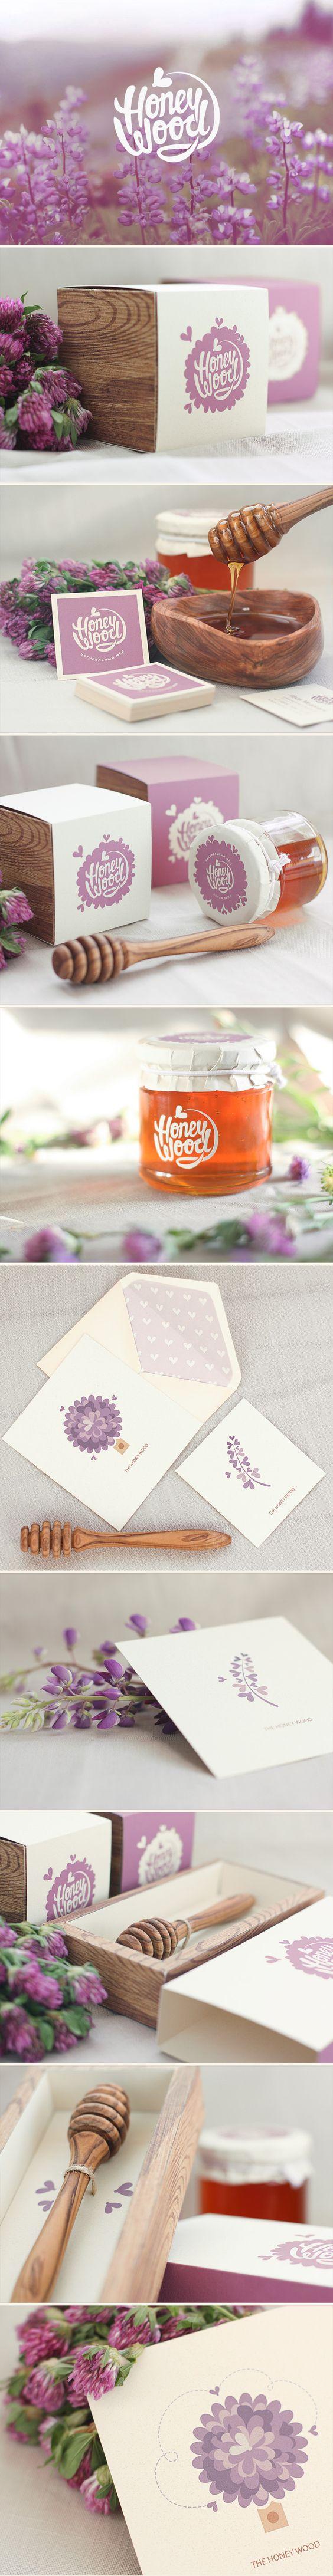 Honey Wood Фирменный стиль © Mari Tropova, Serg Tropov #identity #packaging #branding #marketing PD